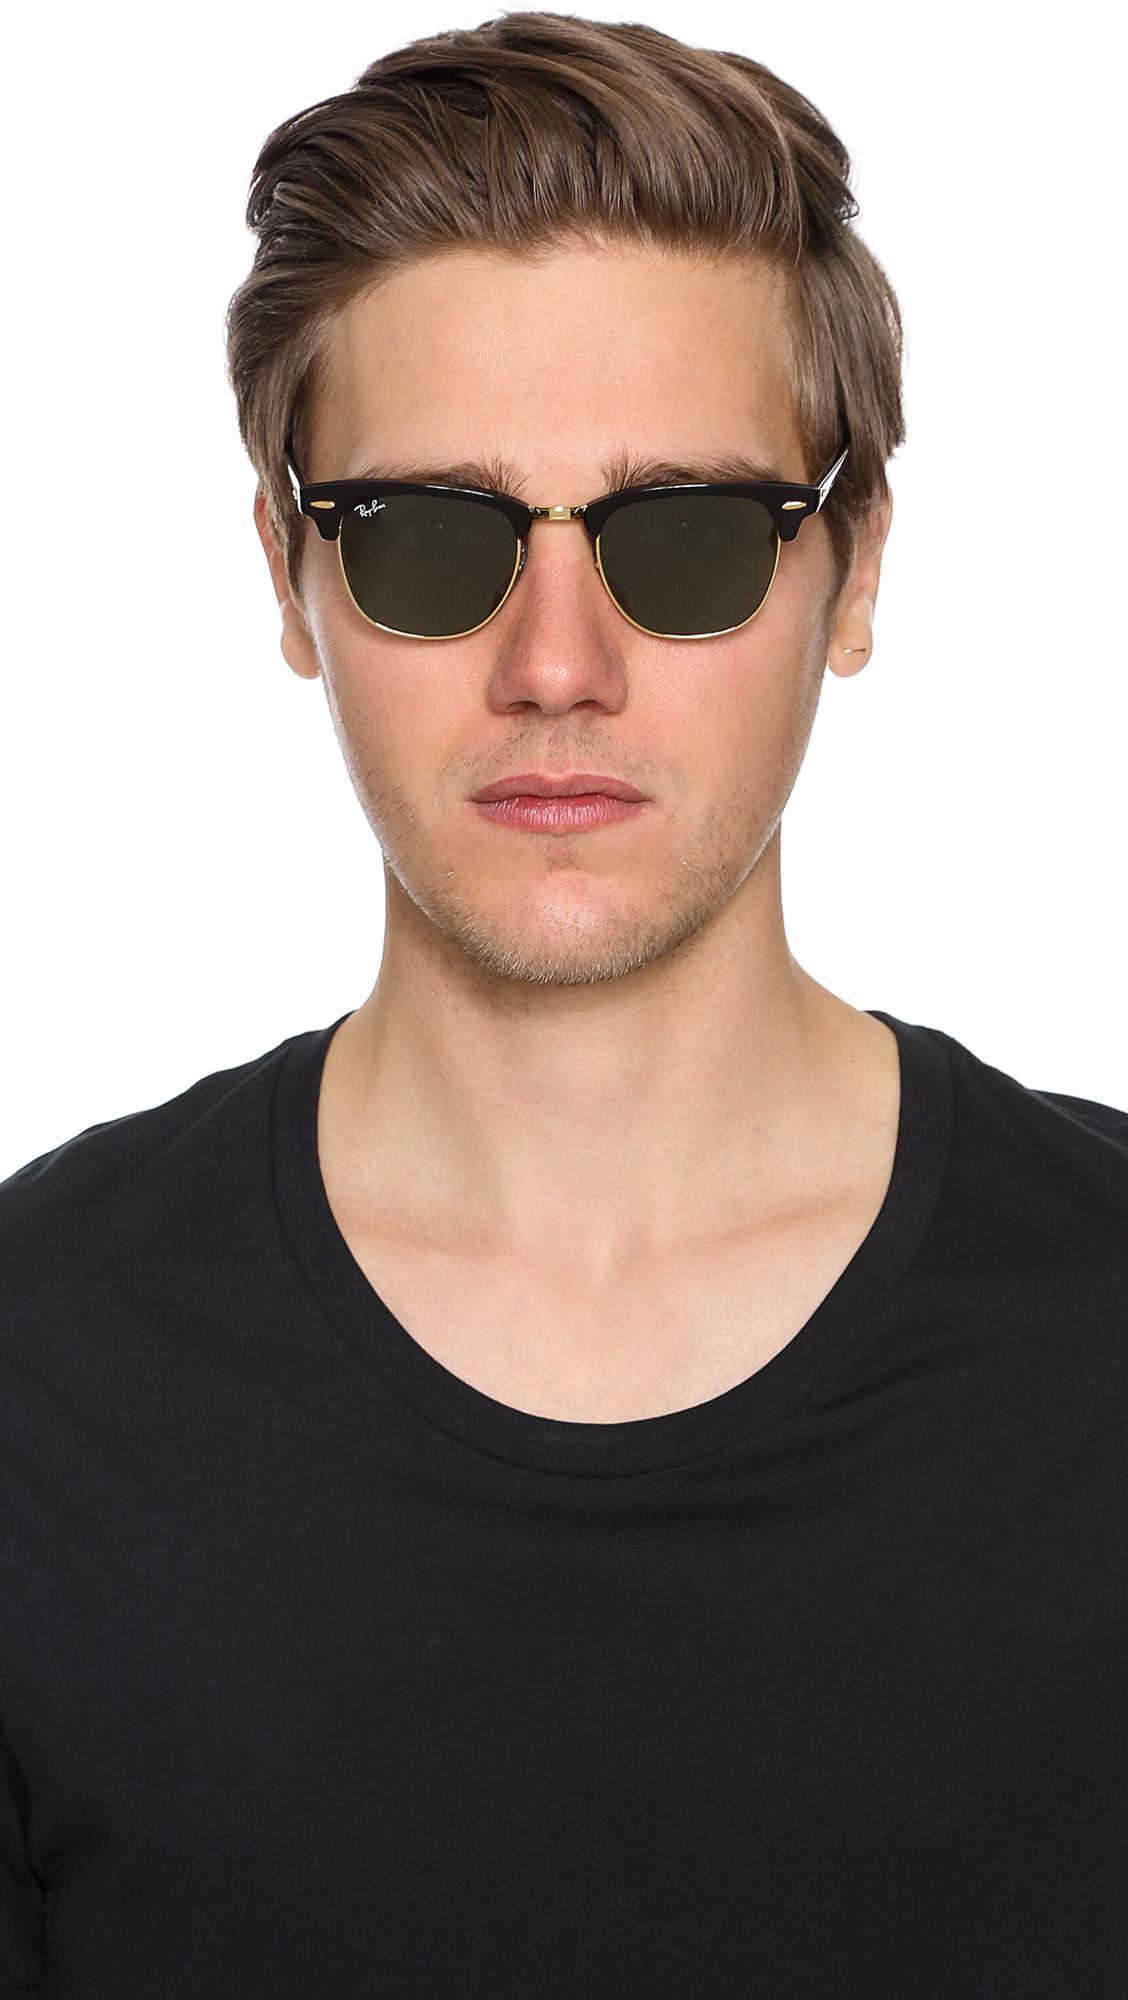 529331e87 ... usa ray ban black clubmaster classic sunglasses for men lyst. view  fullscreen 20612 4814a